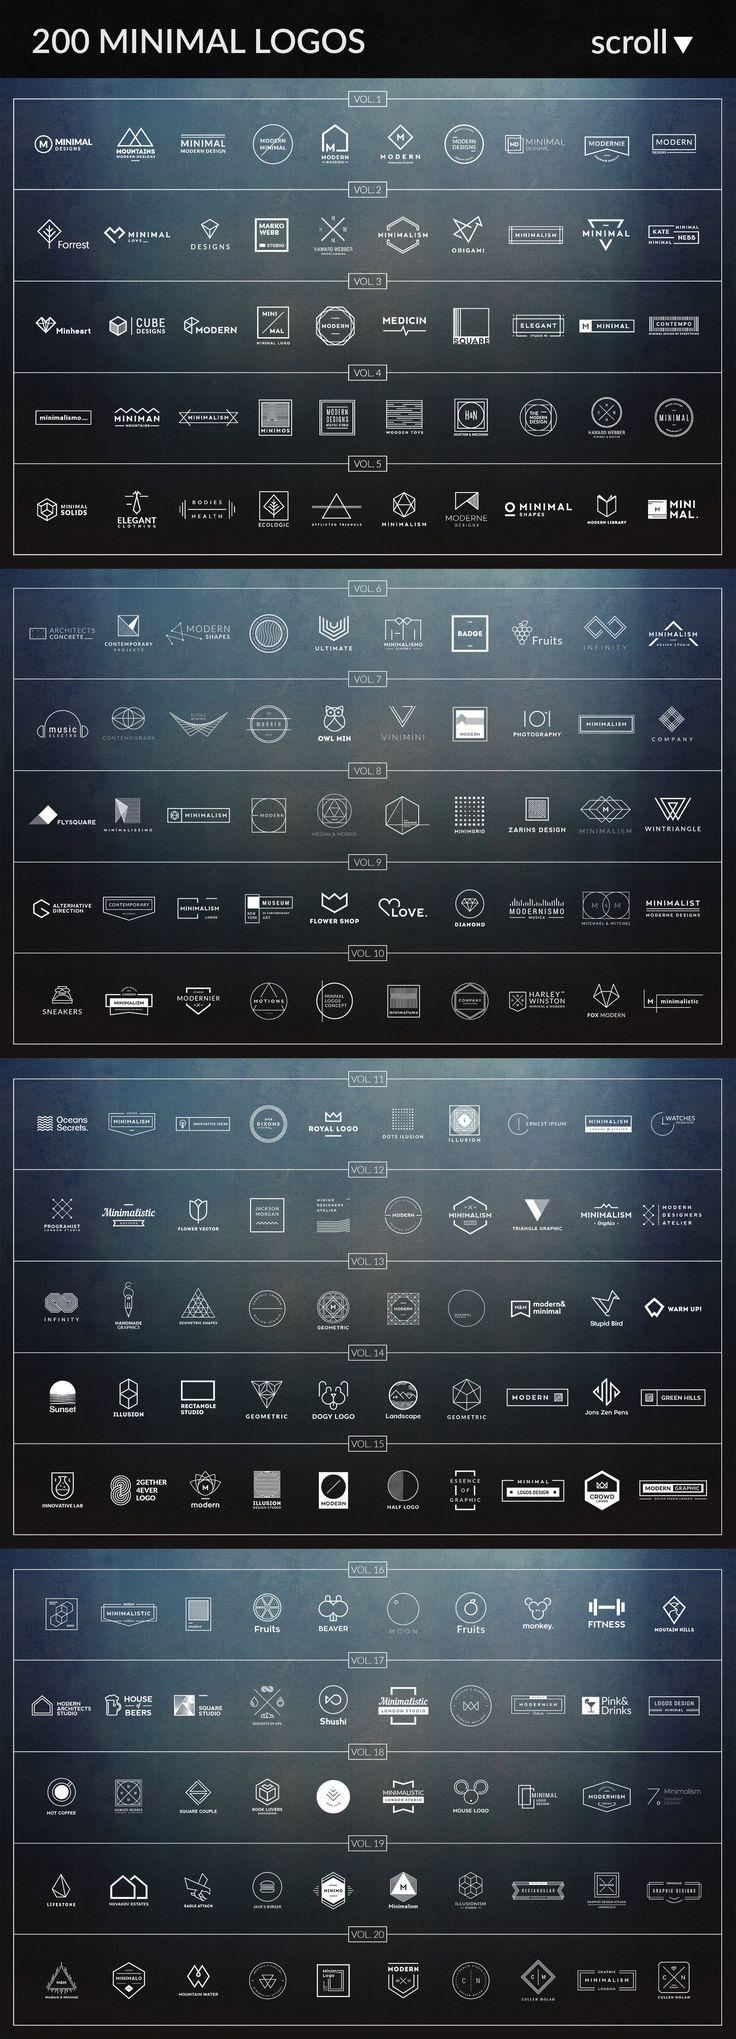 800 Logos & Badges SALE by Piotr Łapa Atelier on @creativemarket